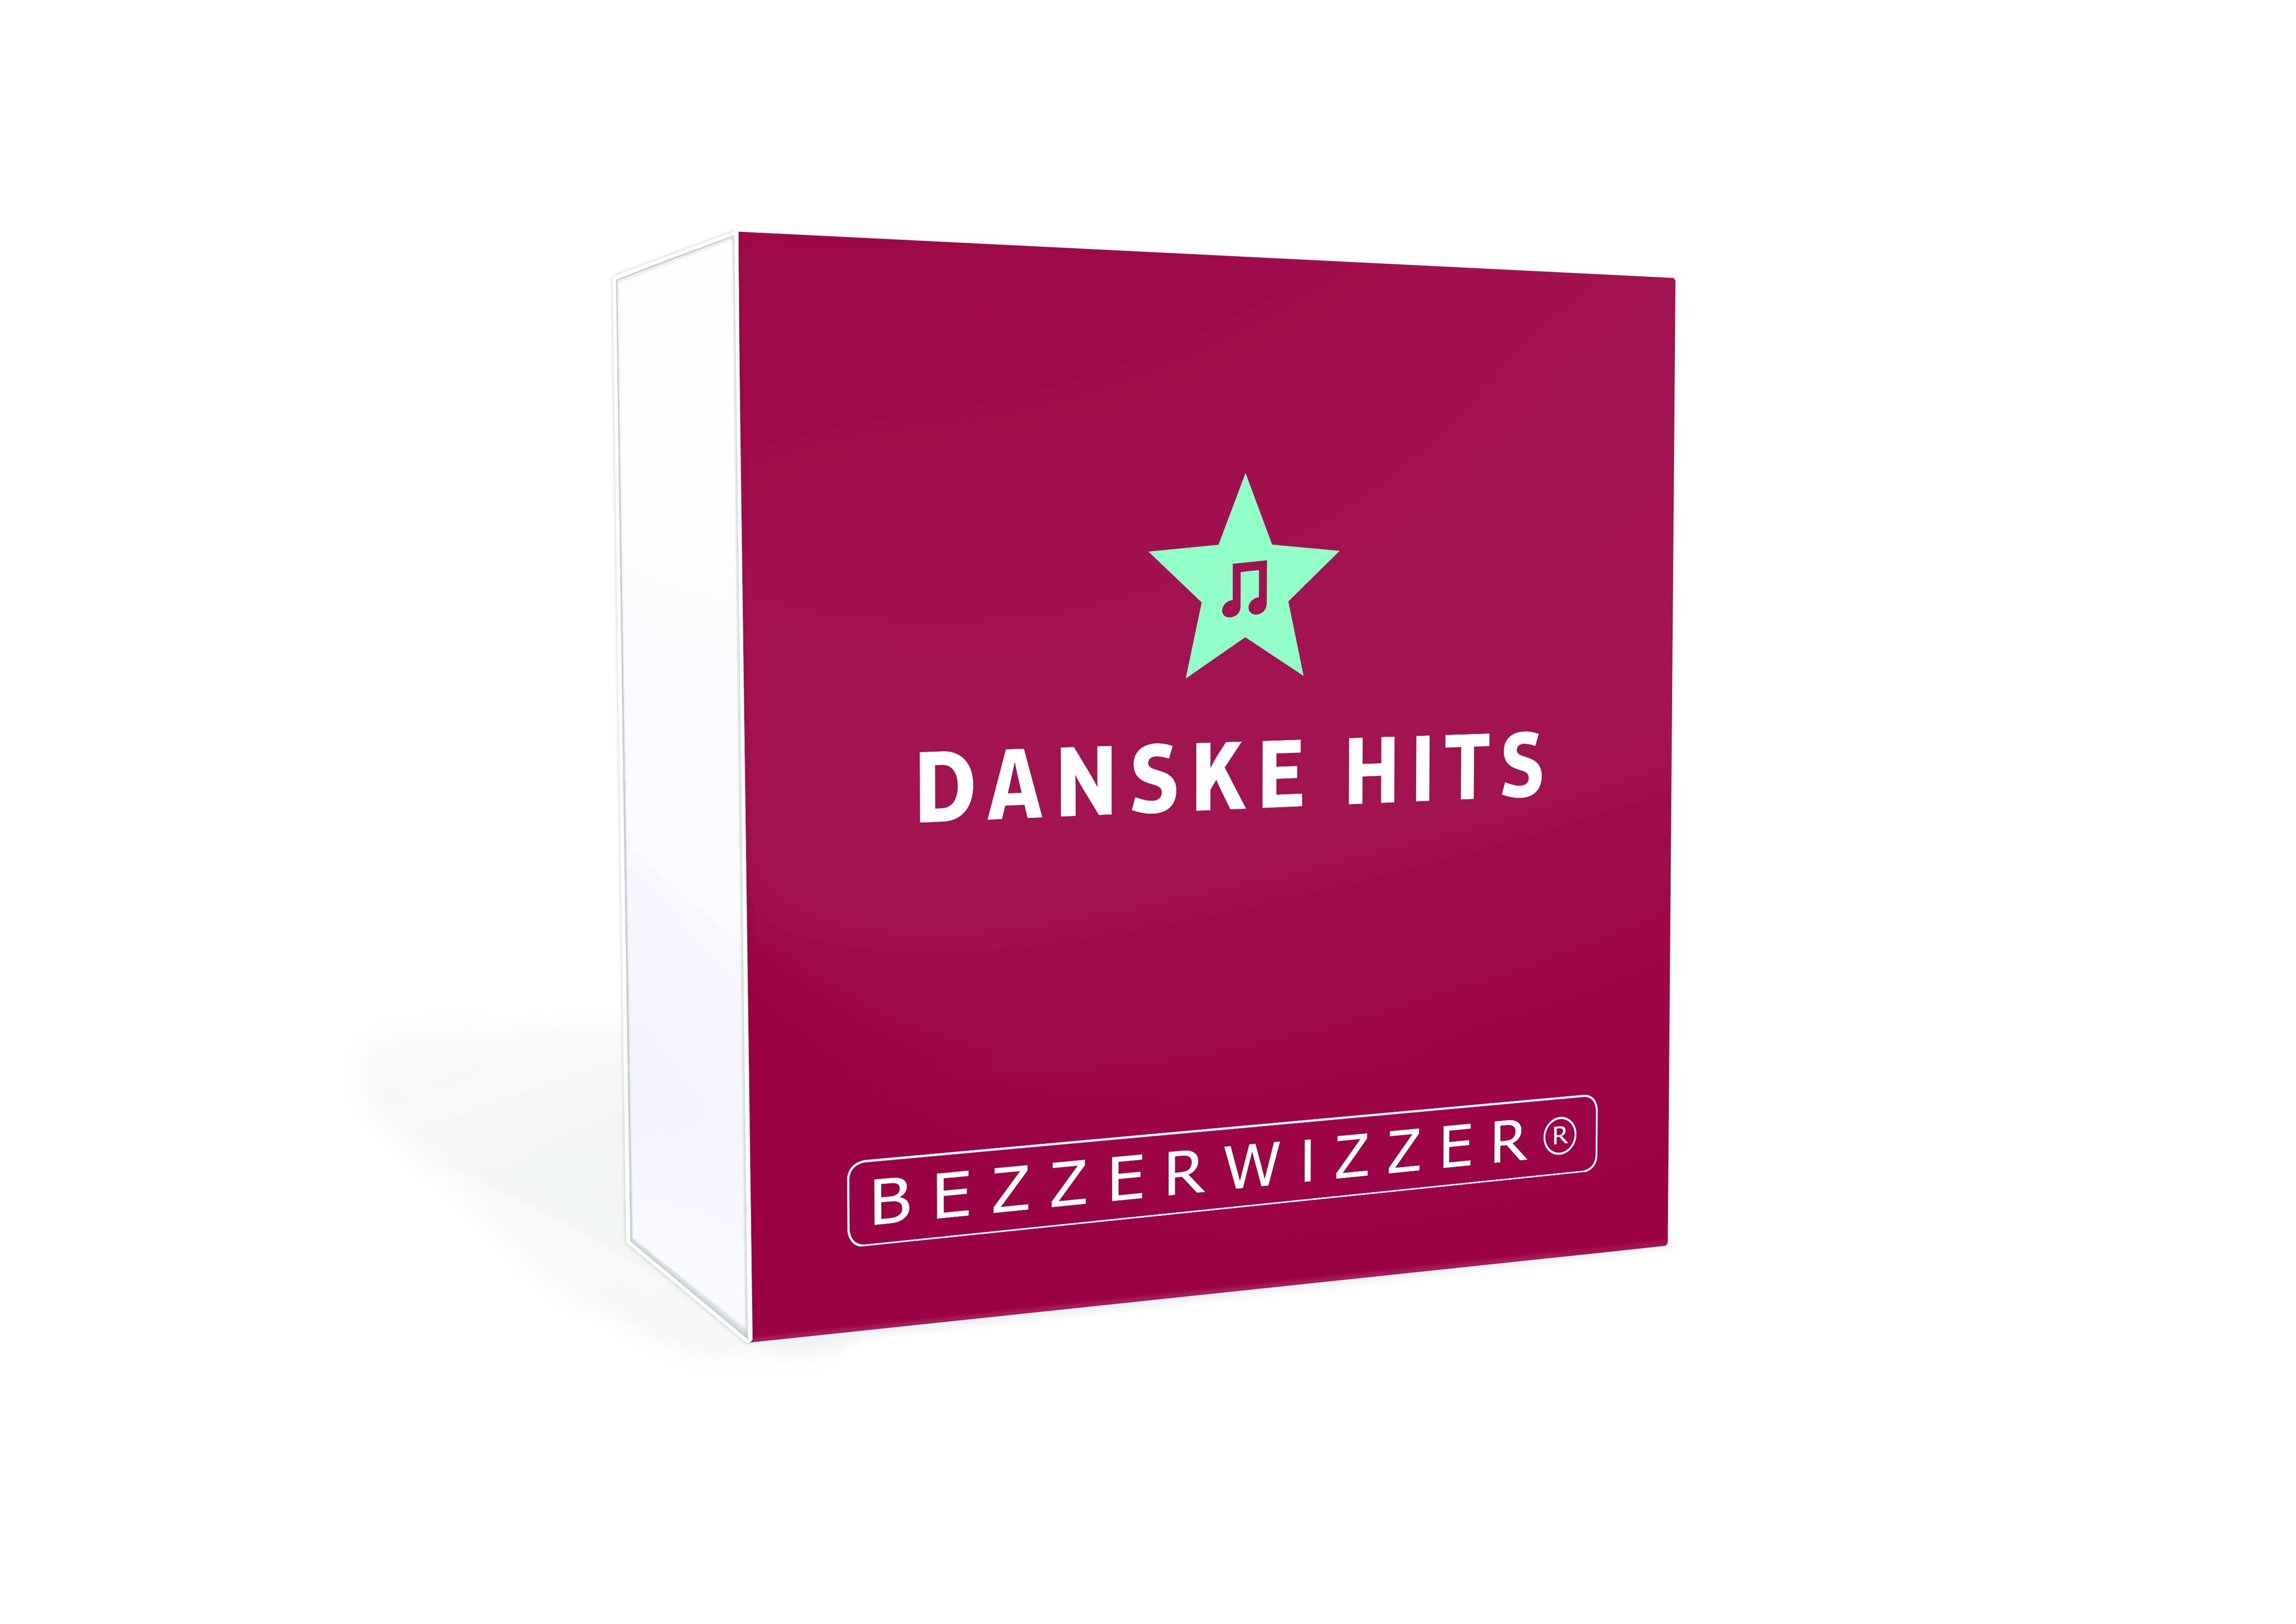 Bezzerwizzer Bricks, danske hits